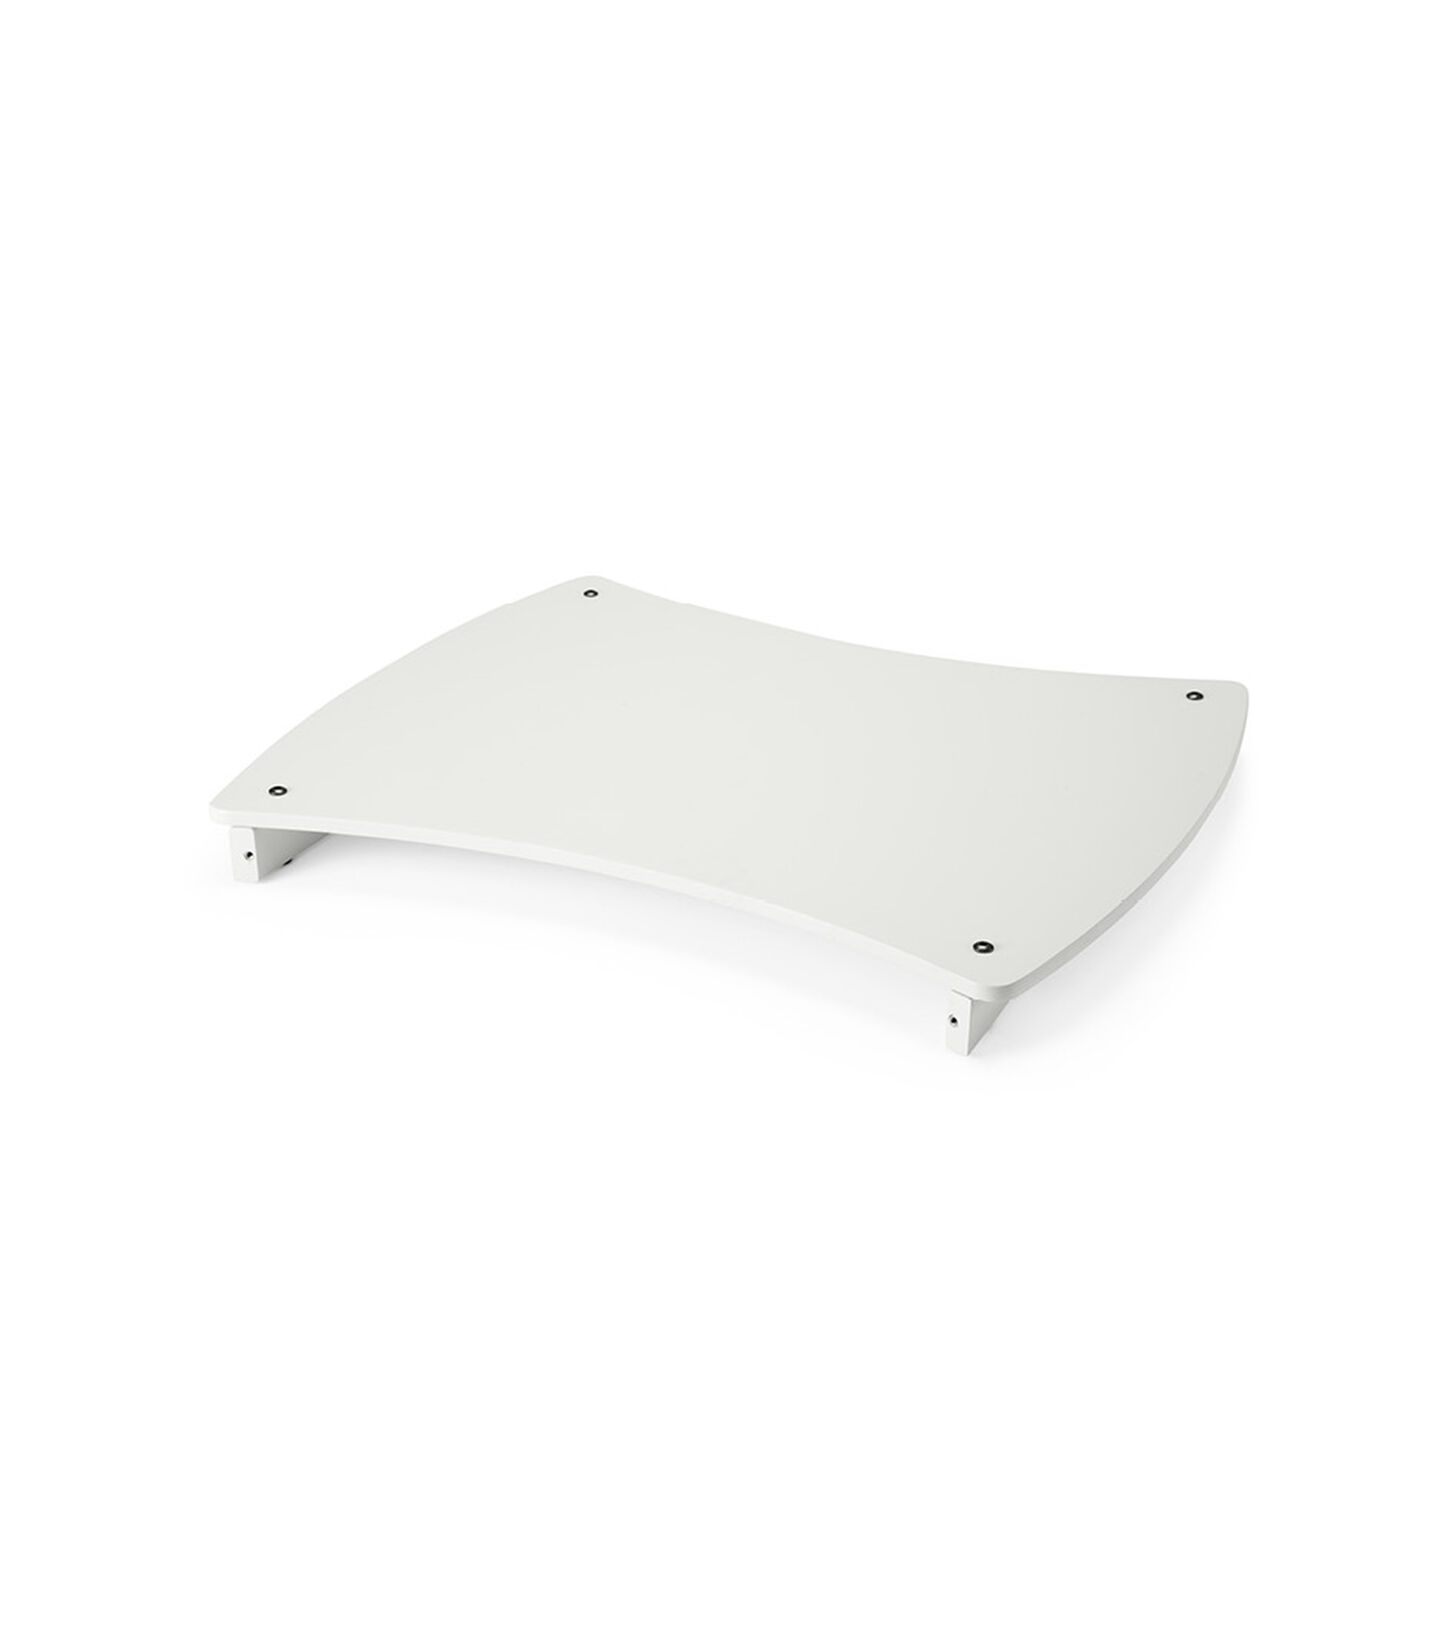 Stokke® Care™ Topshelf compl Bianco, Bianco, mainview view 2